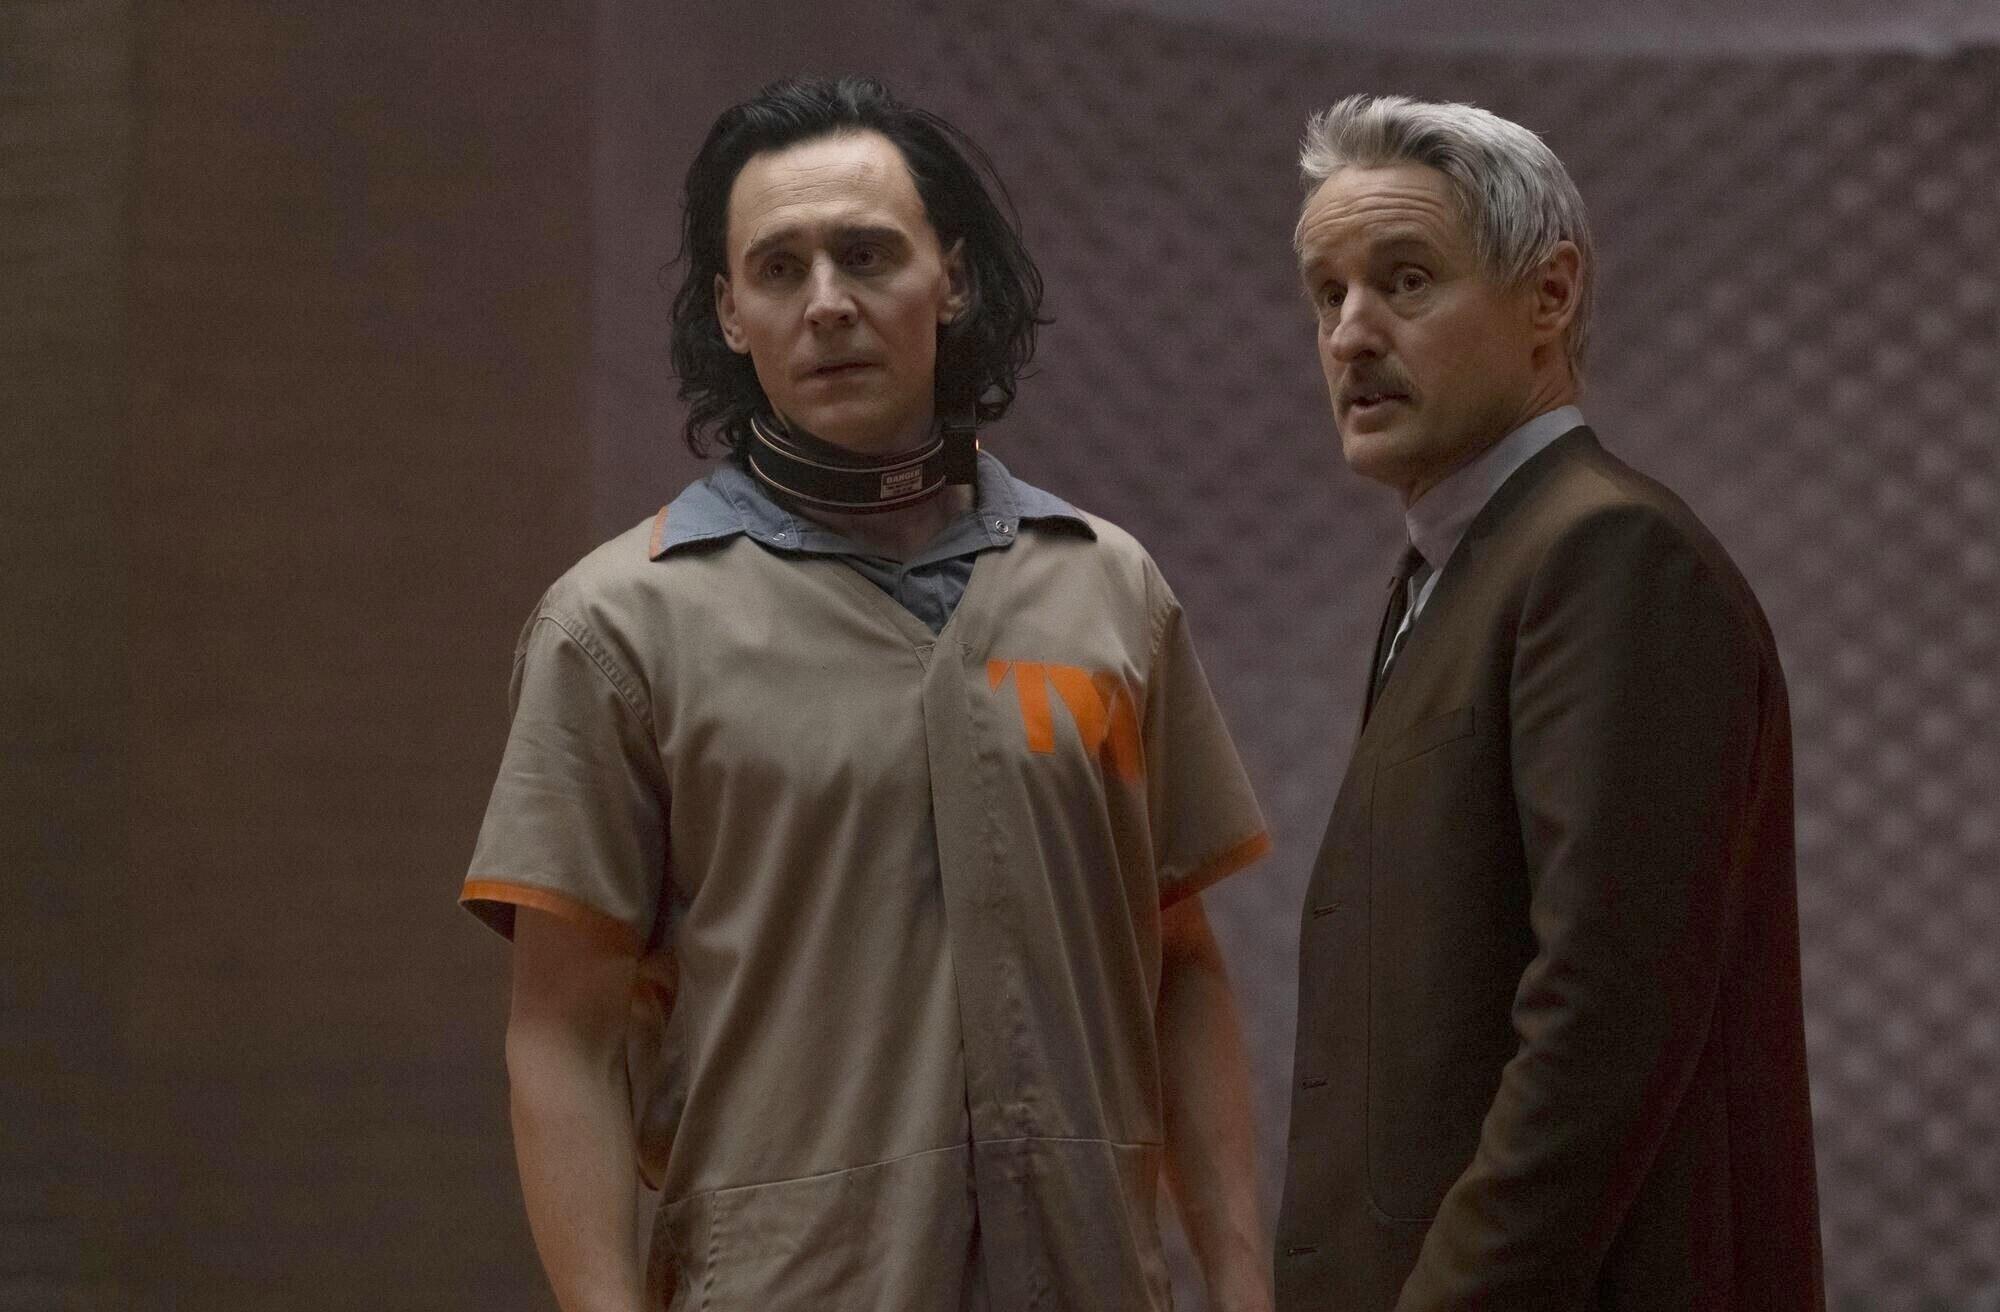 Loki stands in a prison jumpsuit next to Owen Wilson